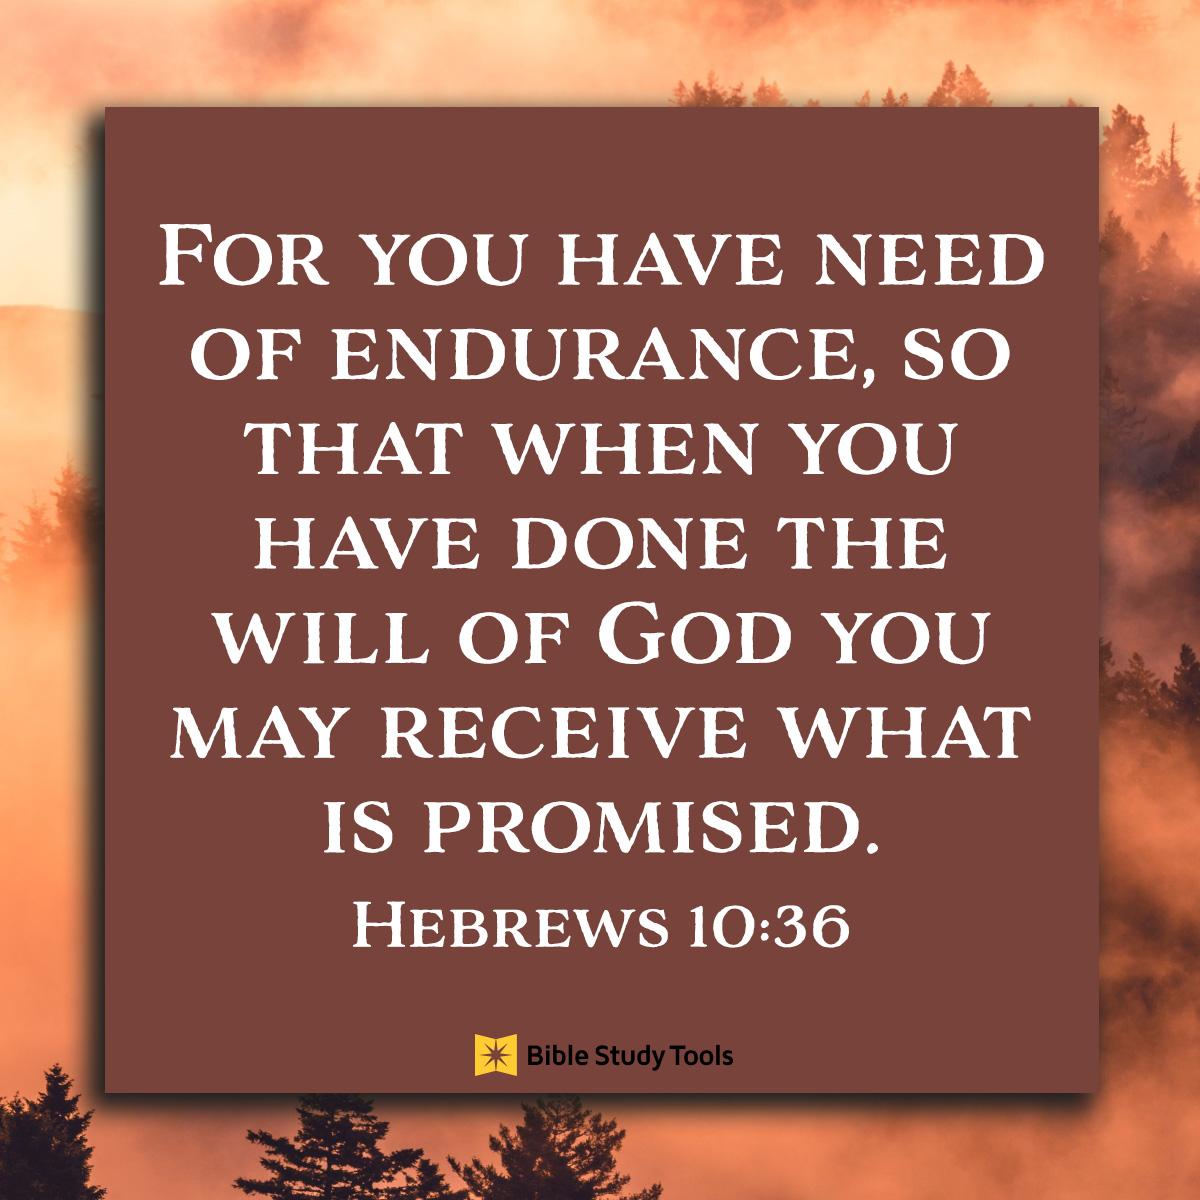 Hebrews 10:36, inspirational image